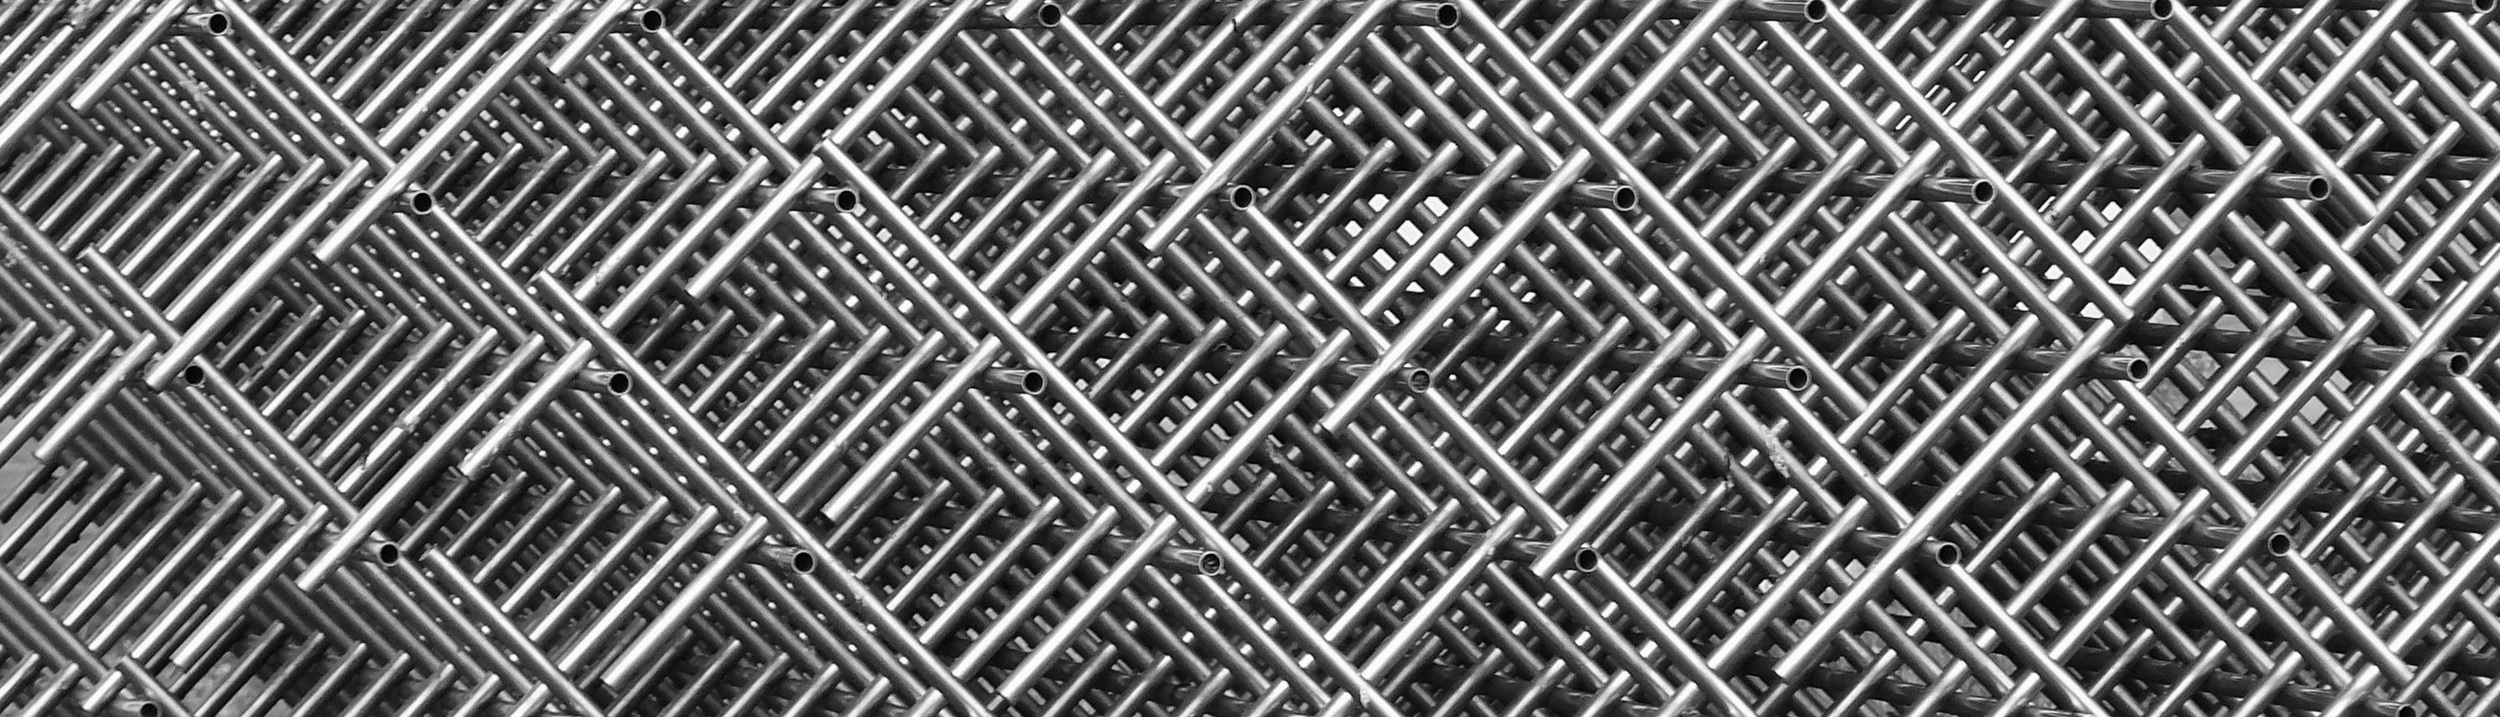 construction-material-grid-metal-35543.jpg